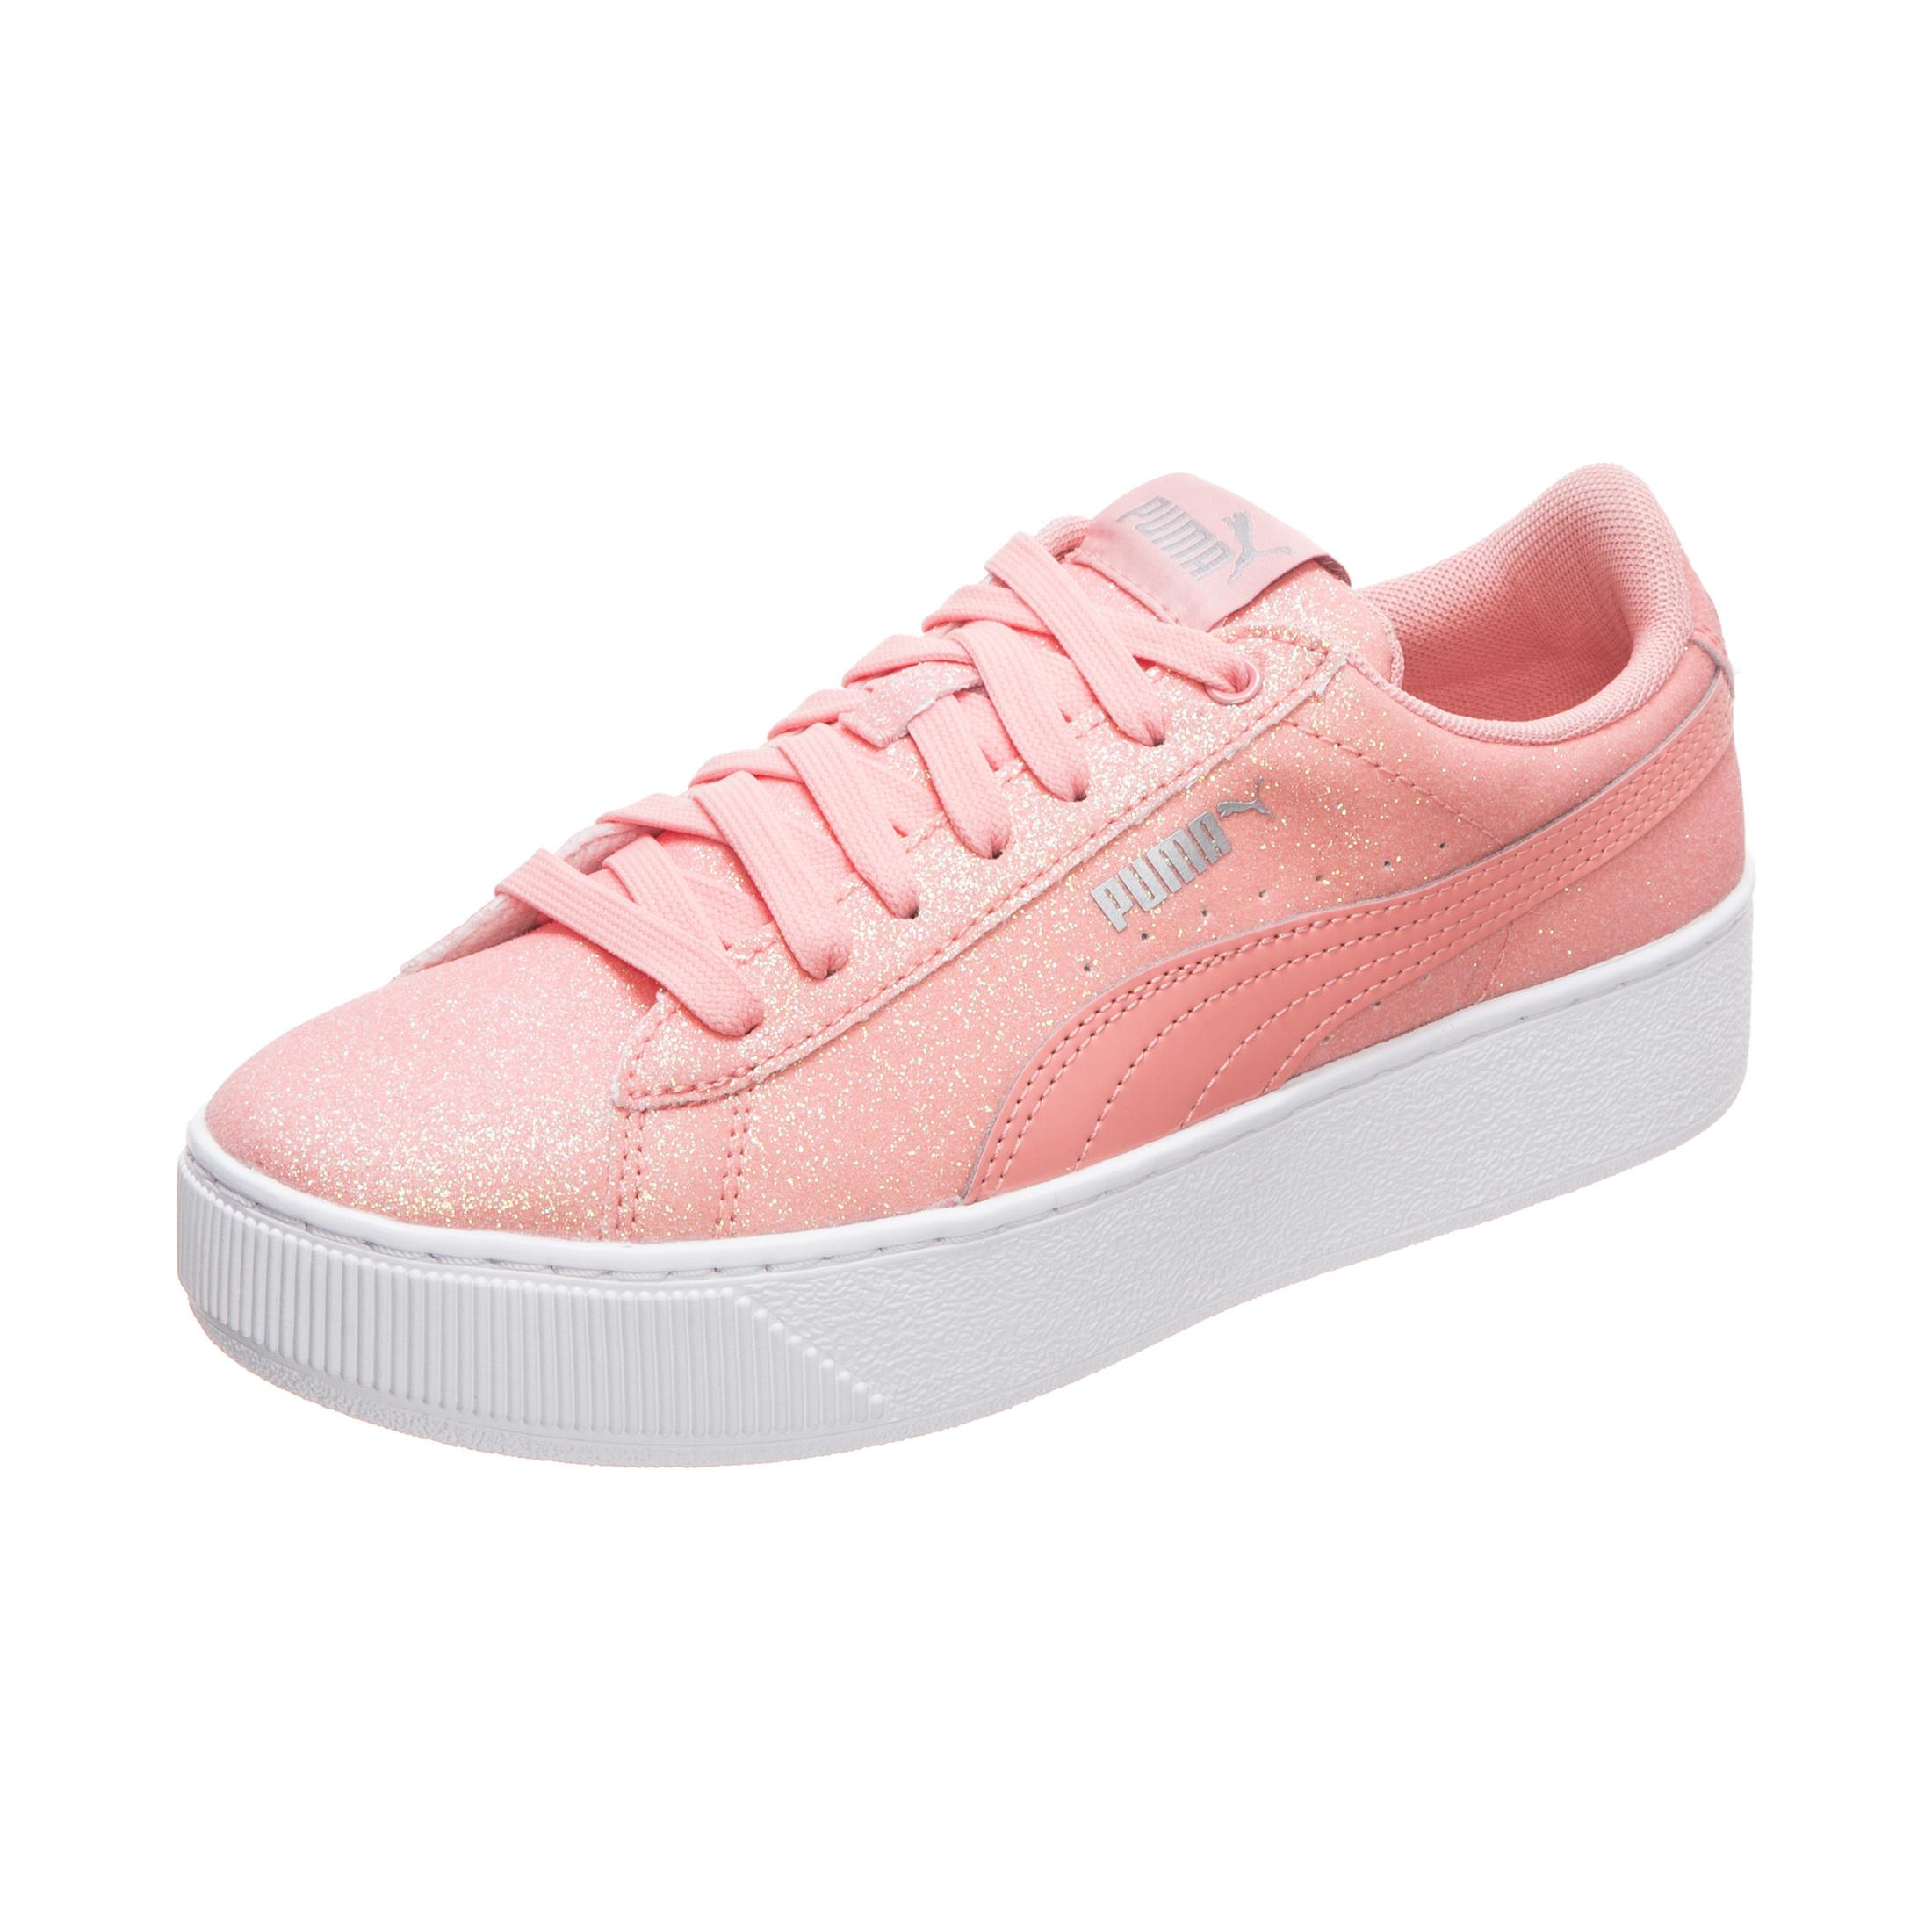 Sneakers low VIKKY PLATFORM GLITZ JR für Mädchen, PUMA